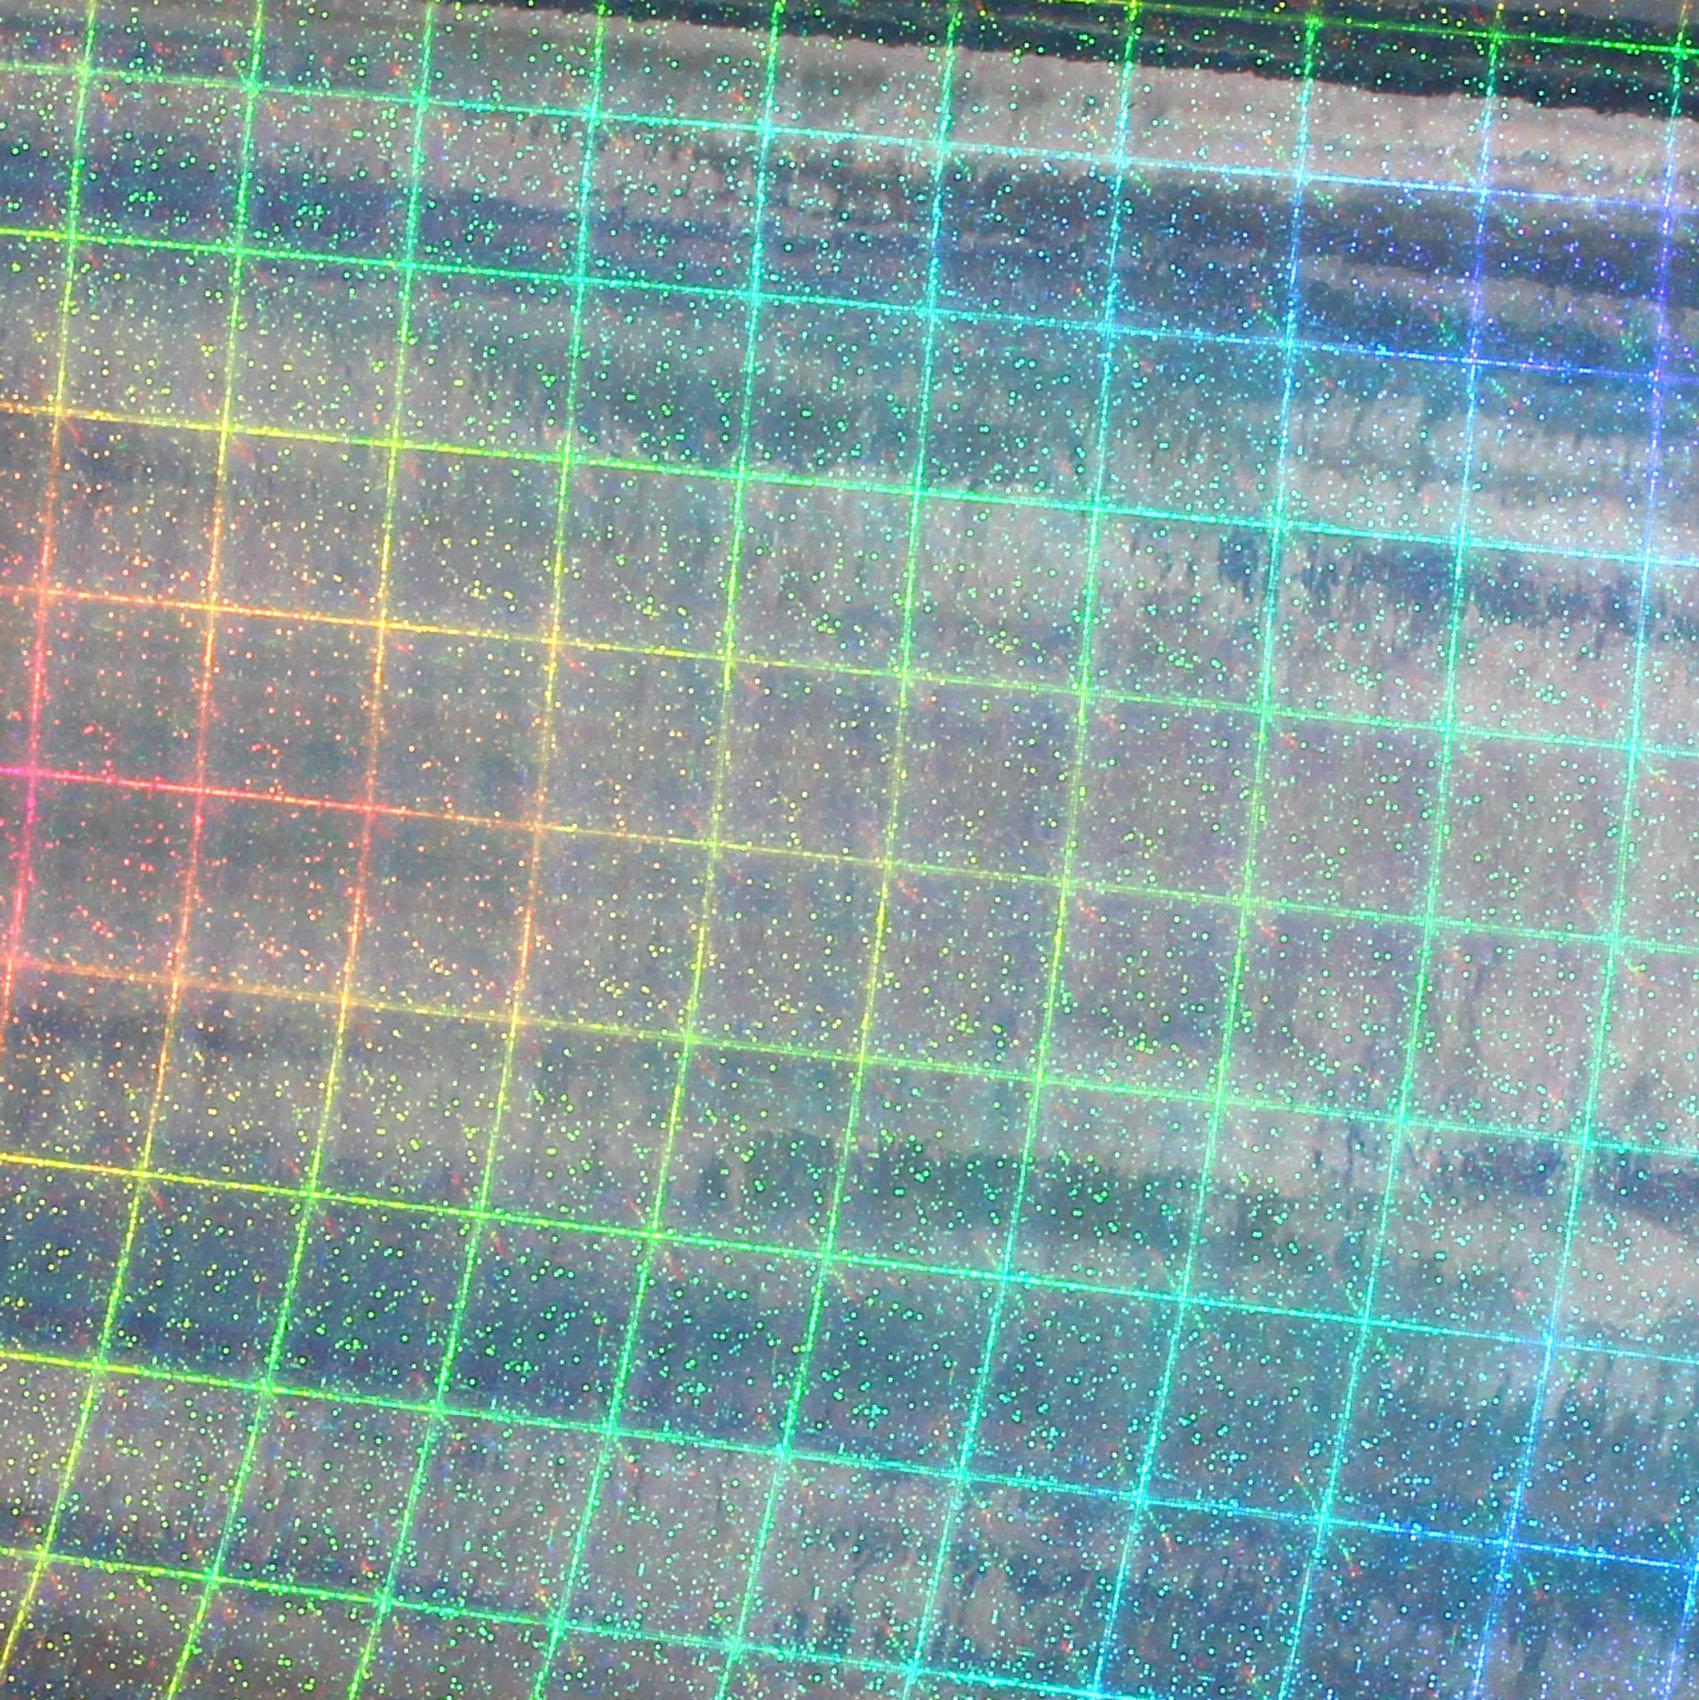 10,94//m² Plotterfolie Hologramm Oilslick Glitzer Folie Aufkleber Plottfolie c